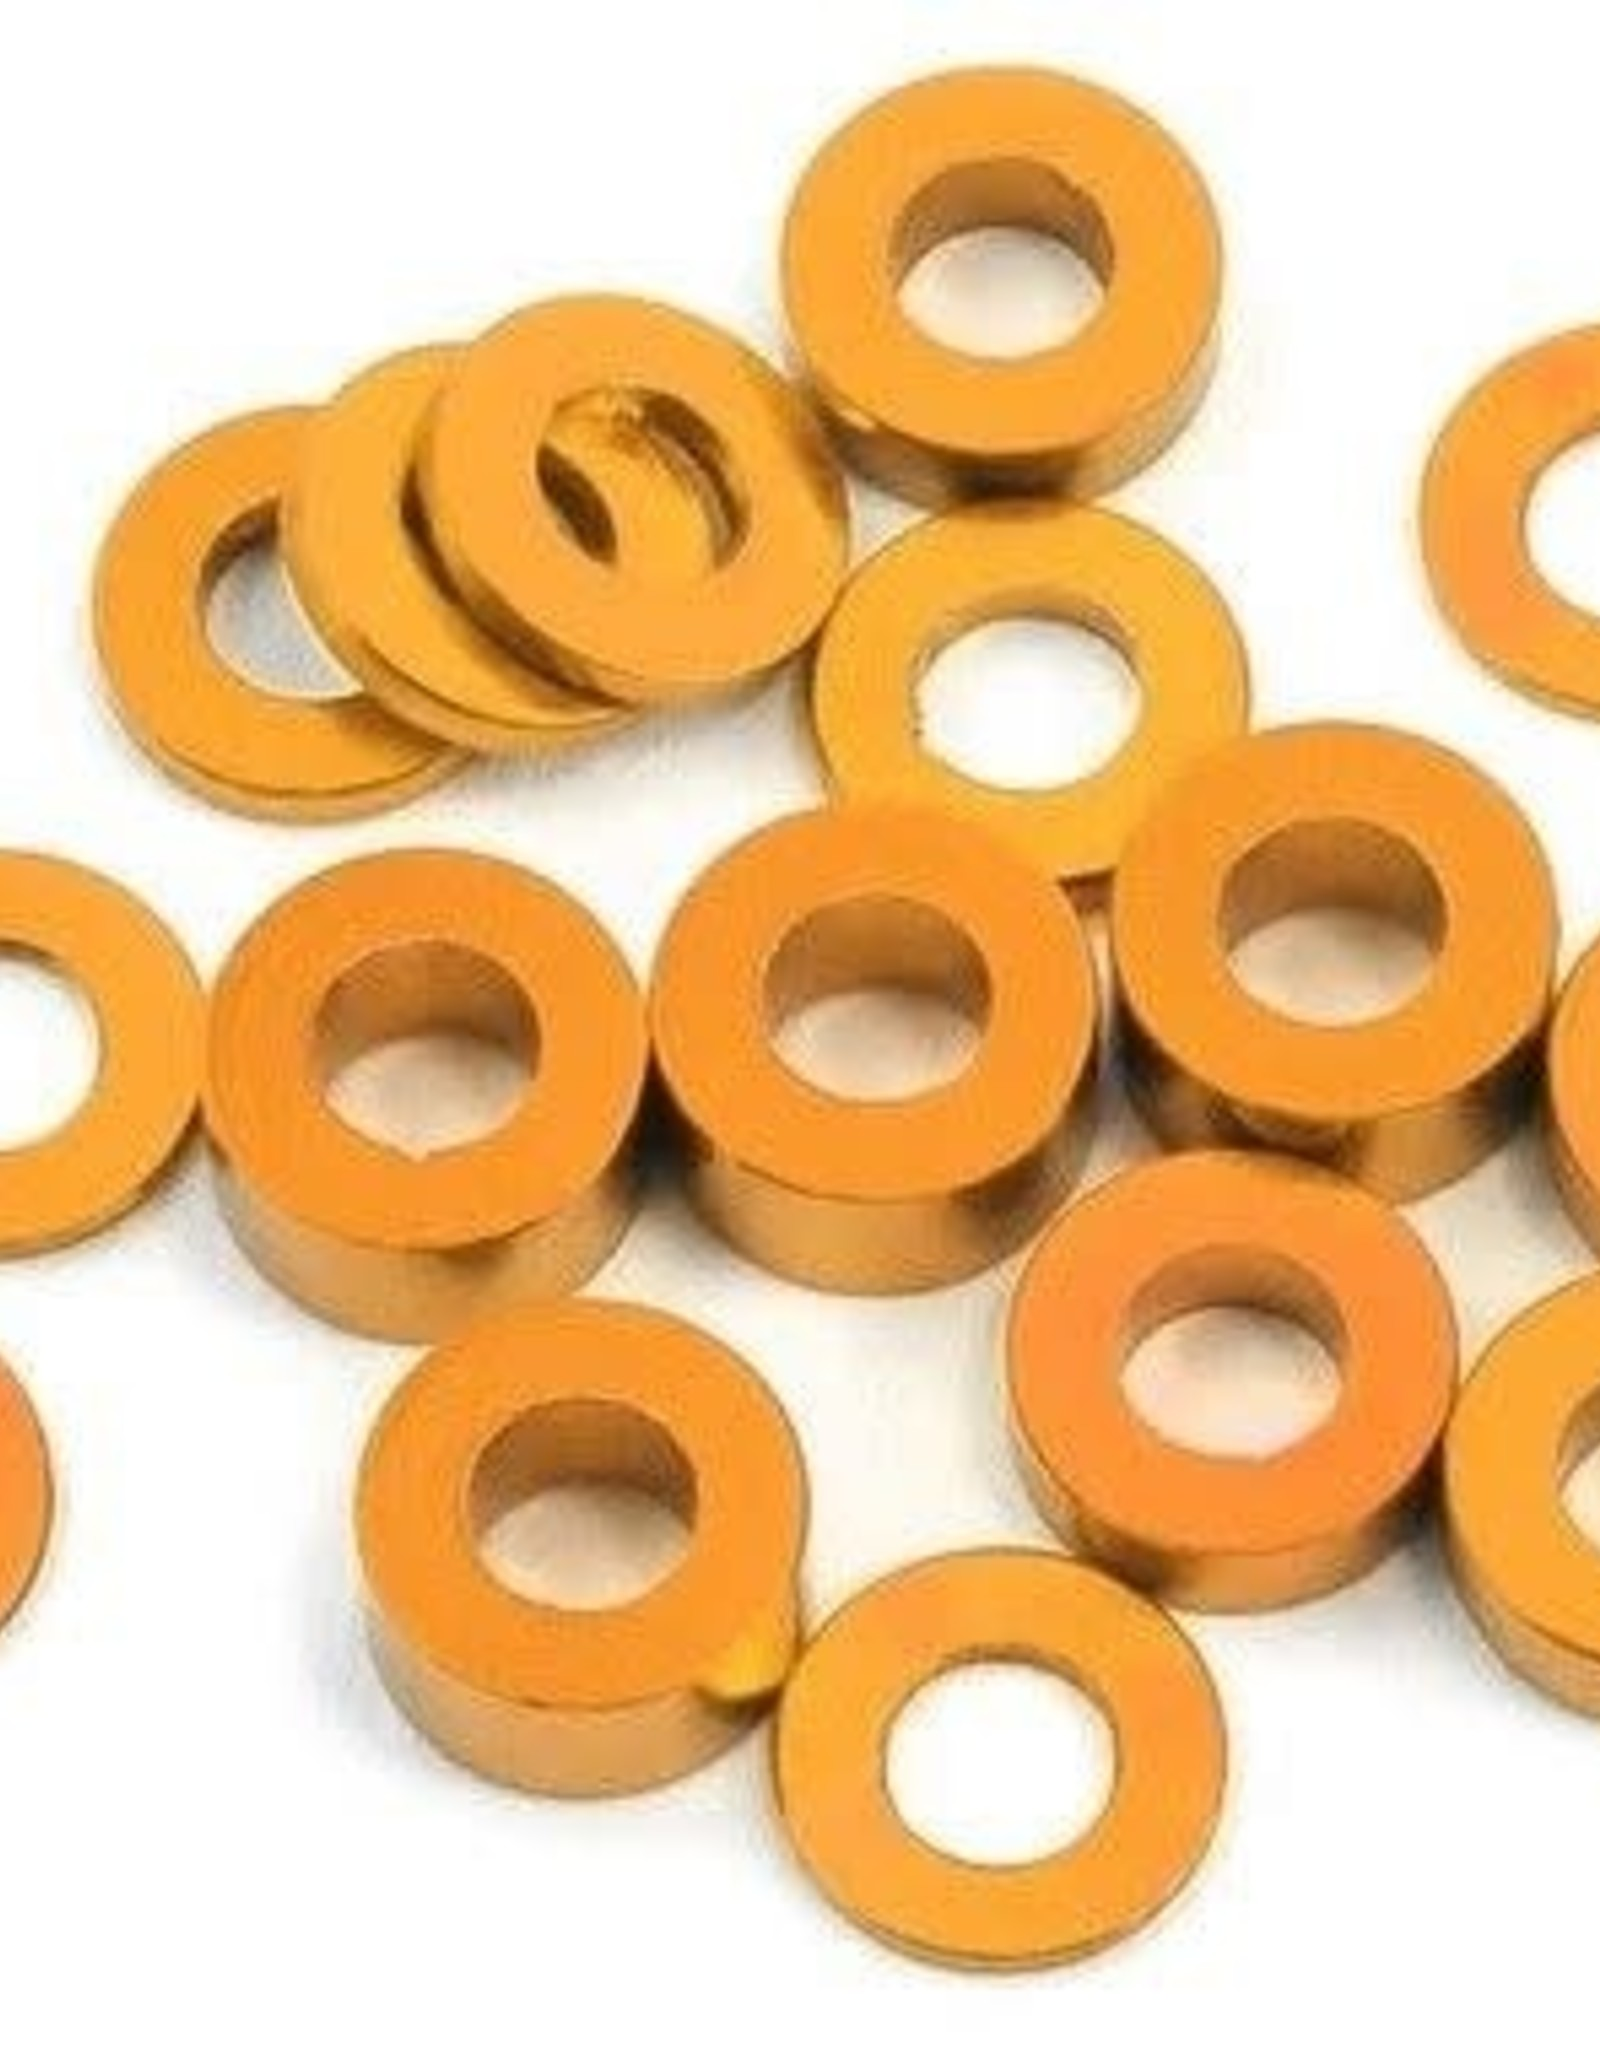 175RC 175RC m3 ballstud washers gold